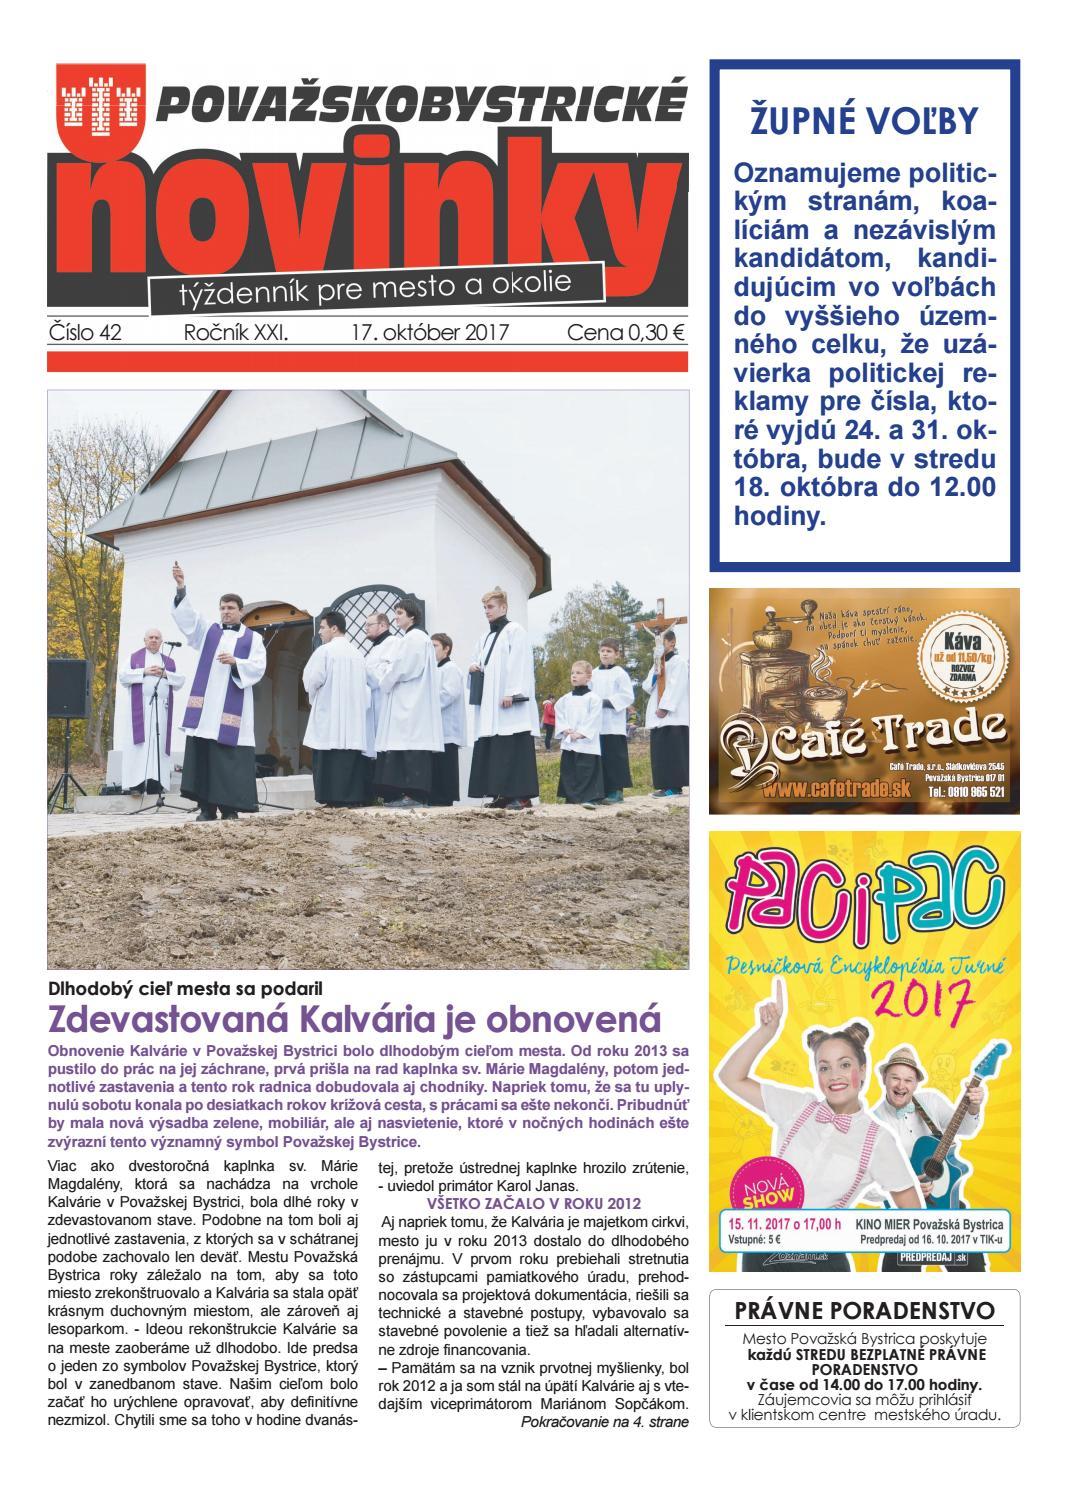 c3483685e Považskobystrické novinky č. 42/2017 by Považskobystrické novinky - issuu